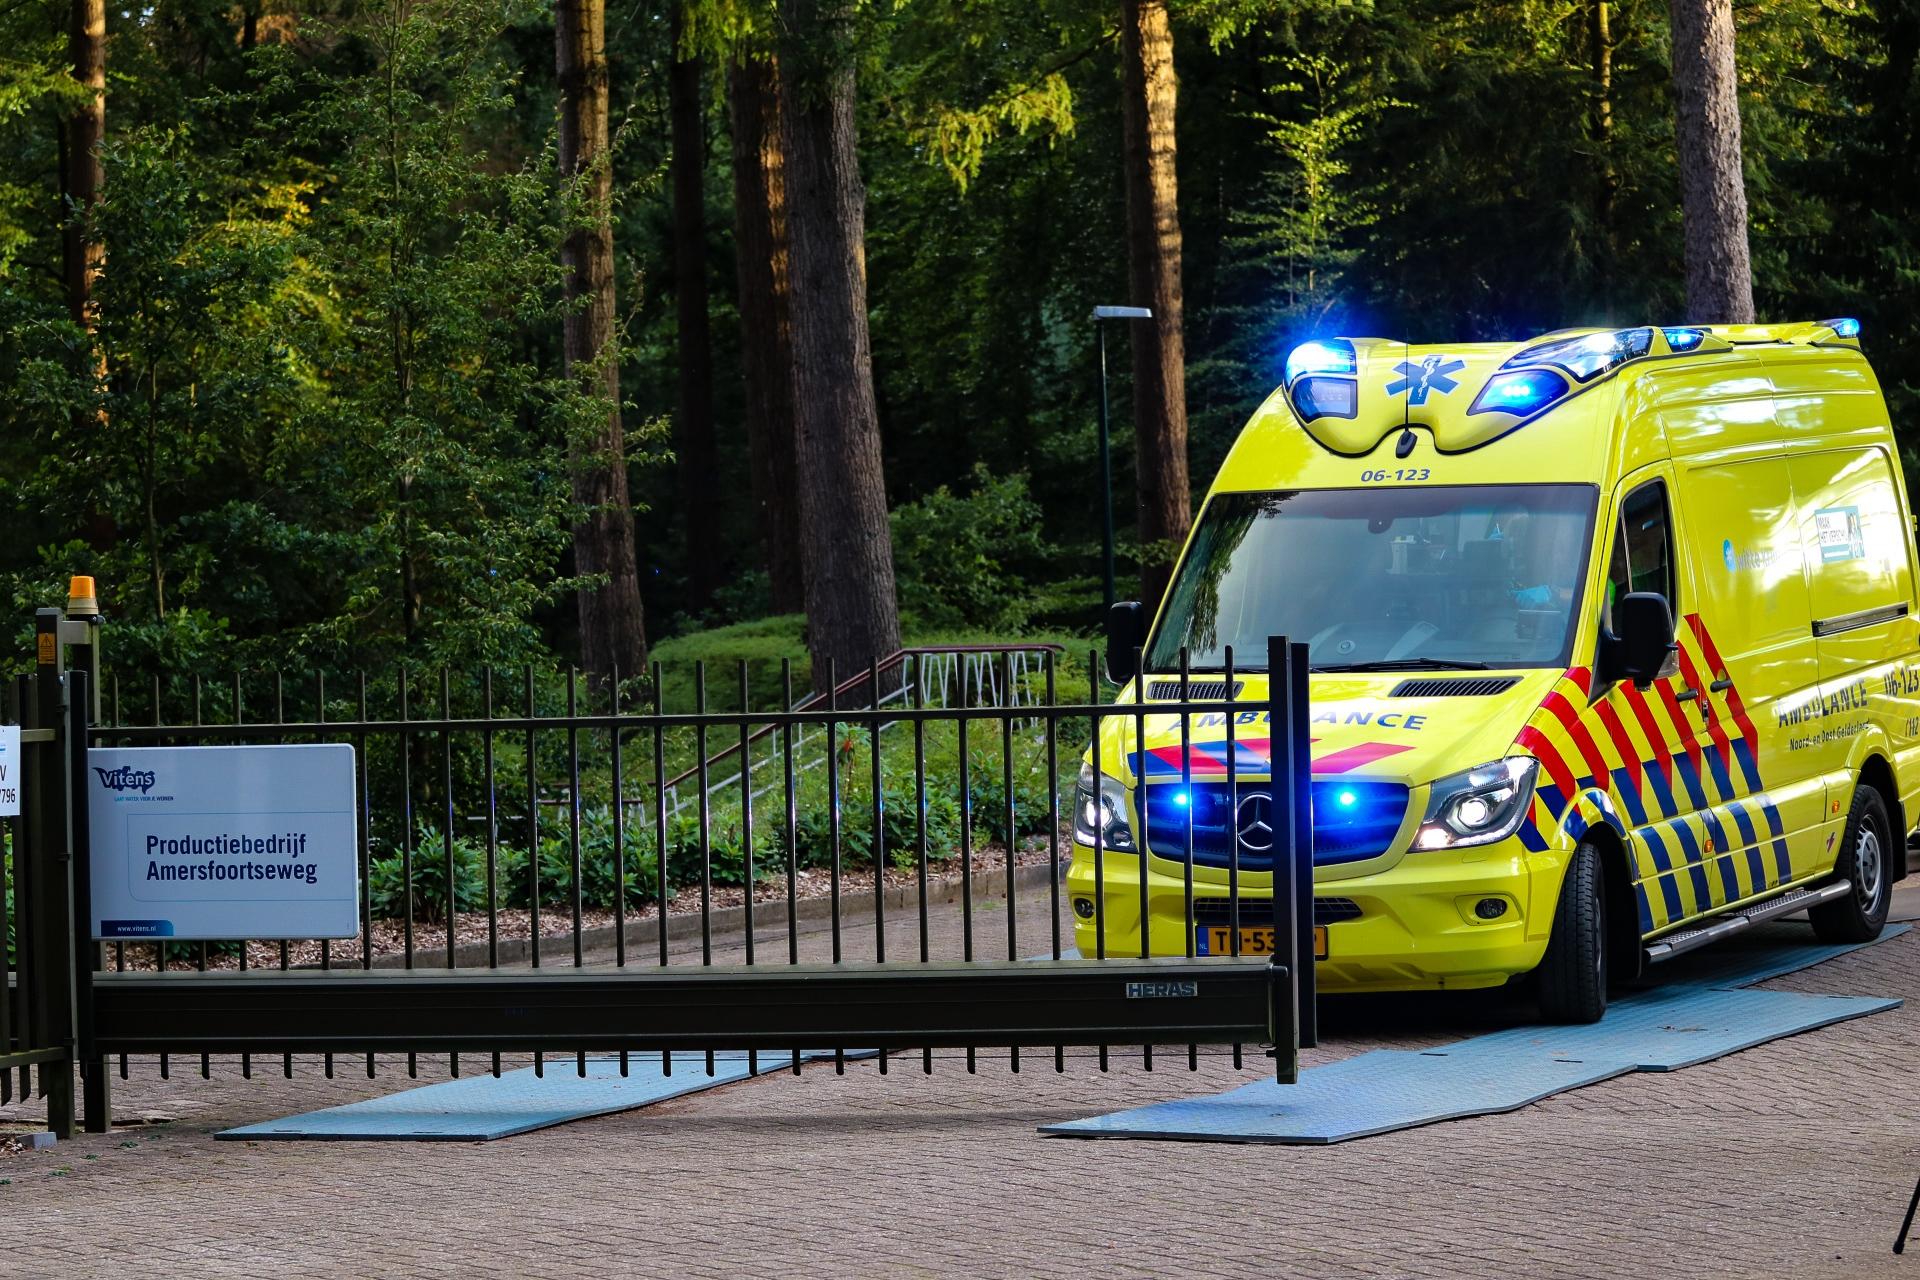 23 Jarige man uit Drenthe zwaargewond na val in bassin